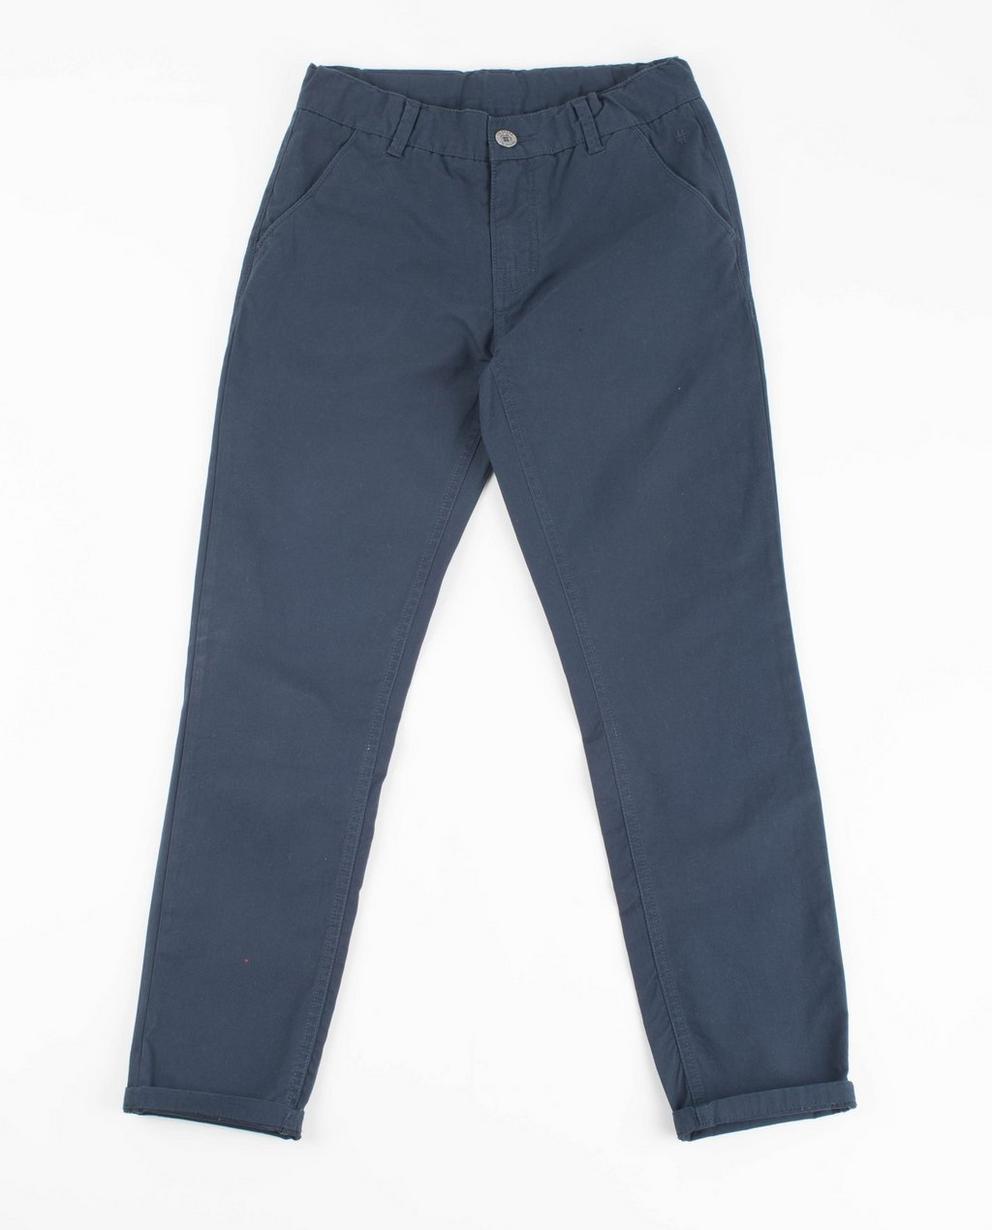 Hose aus Baumwolle - in Marineblau - JBC